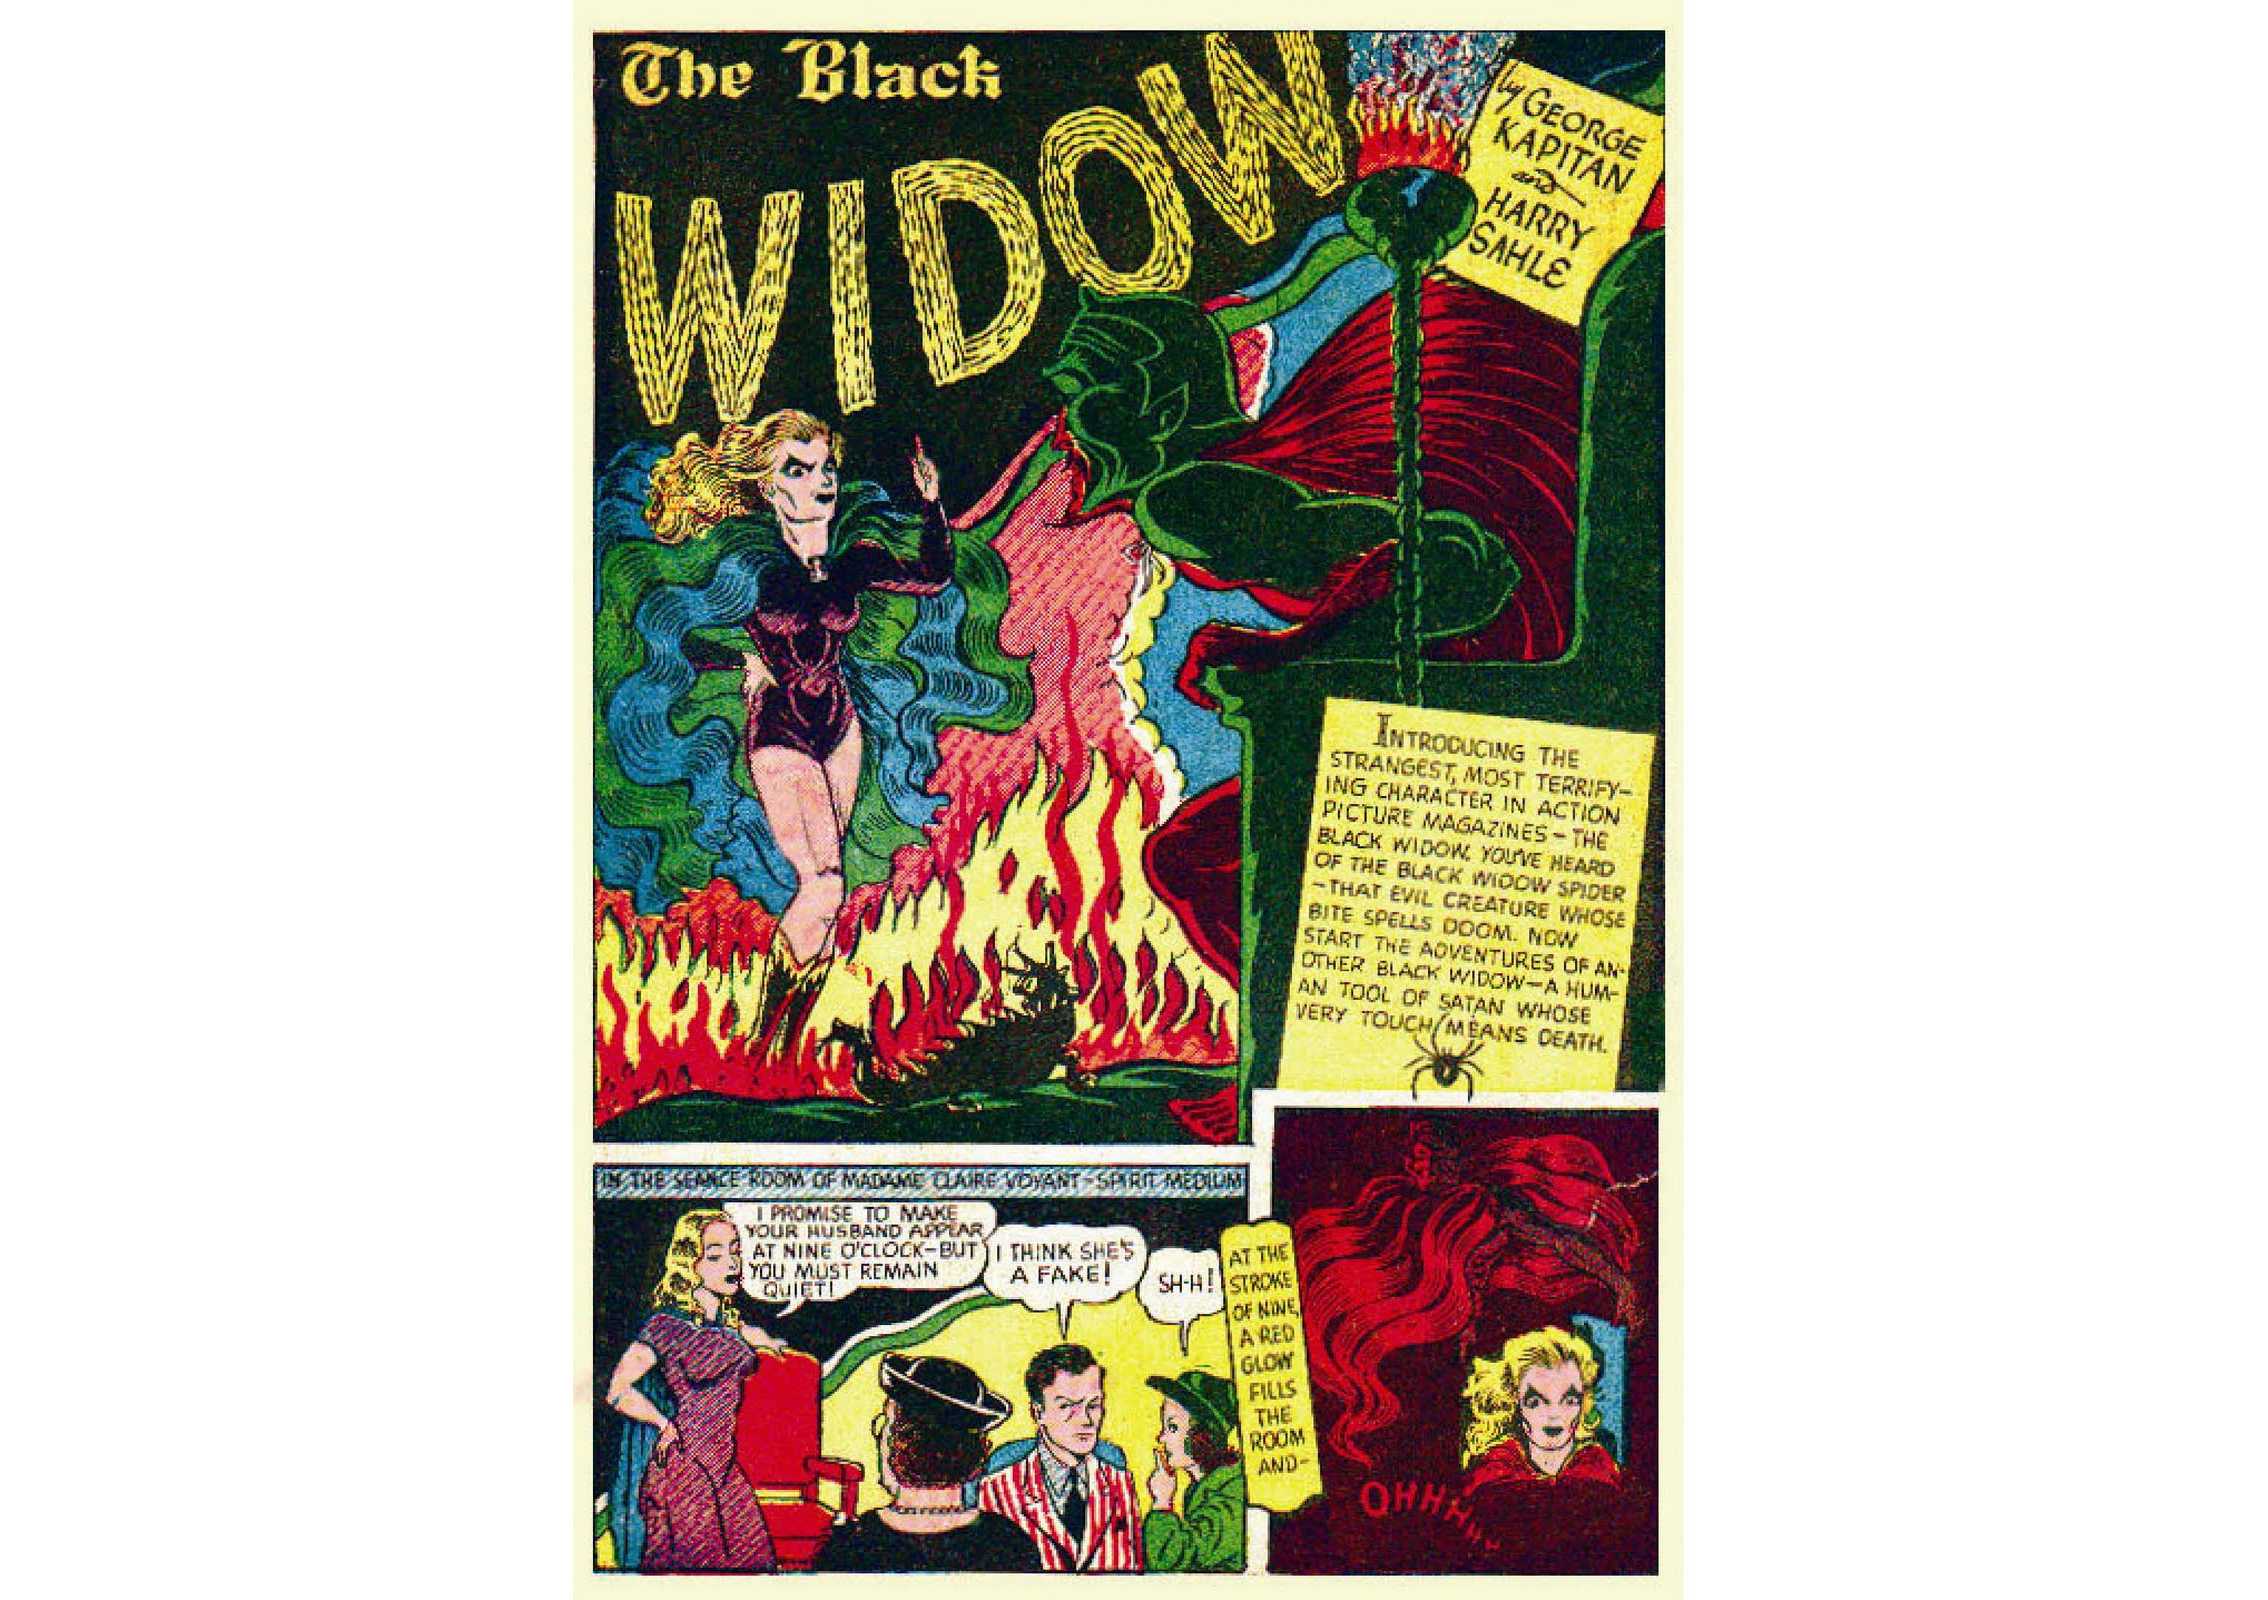 Black Widow Facts